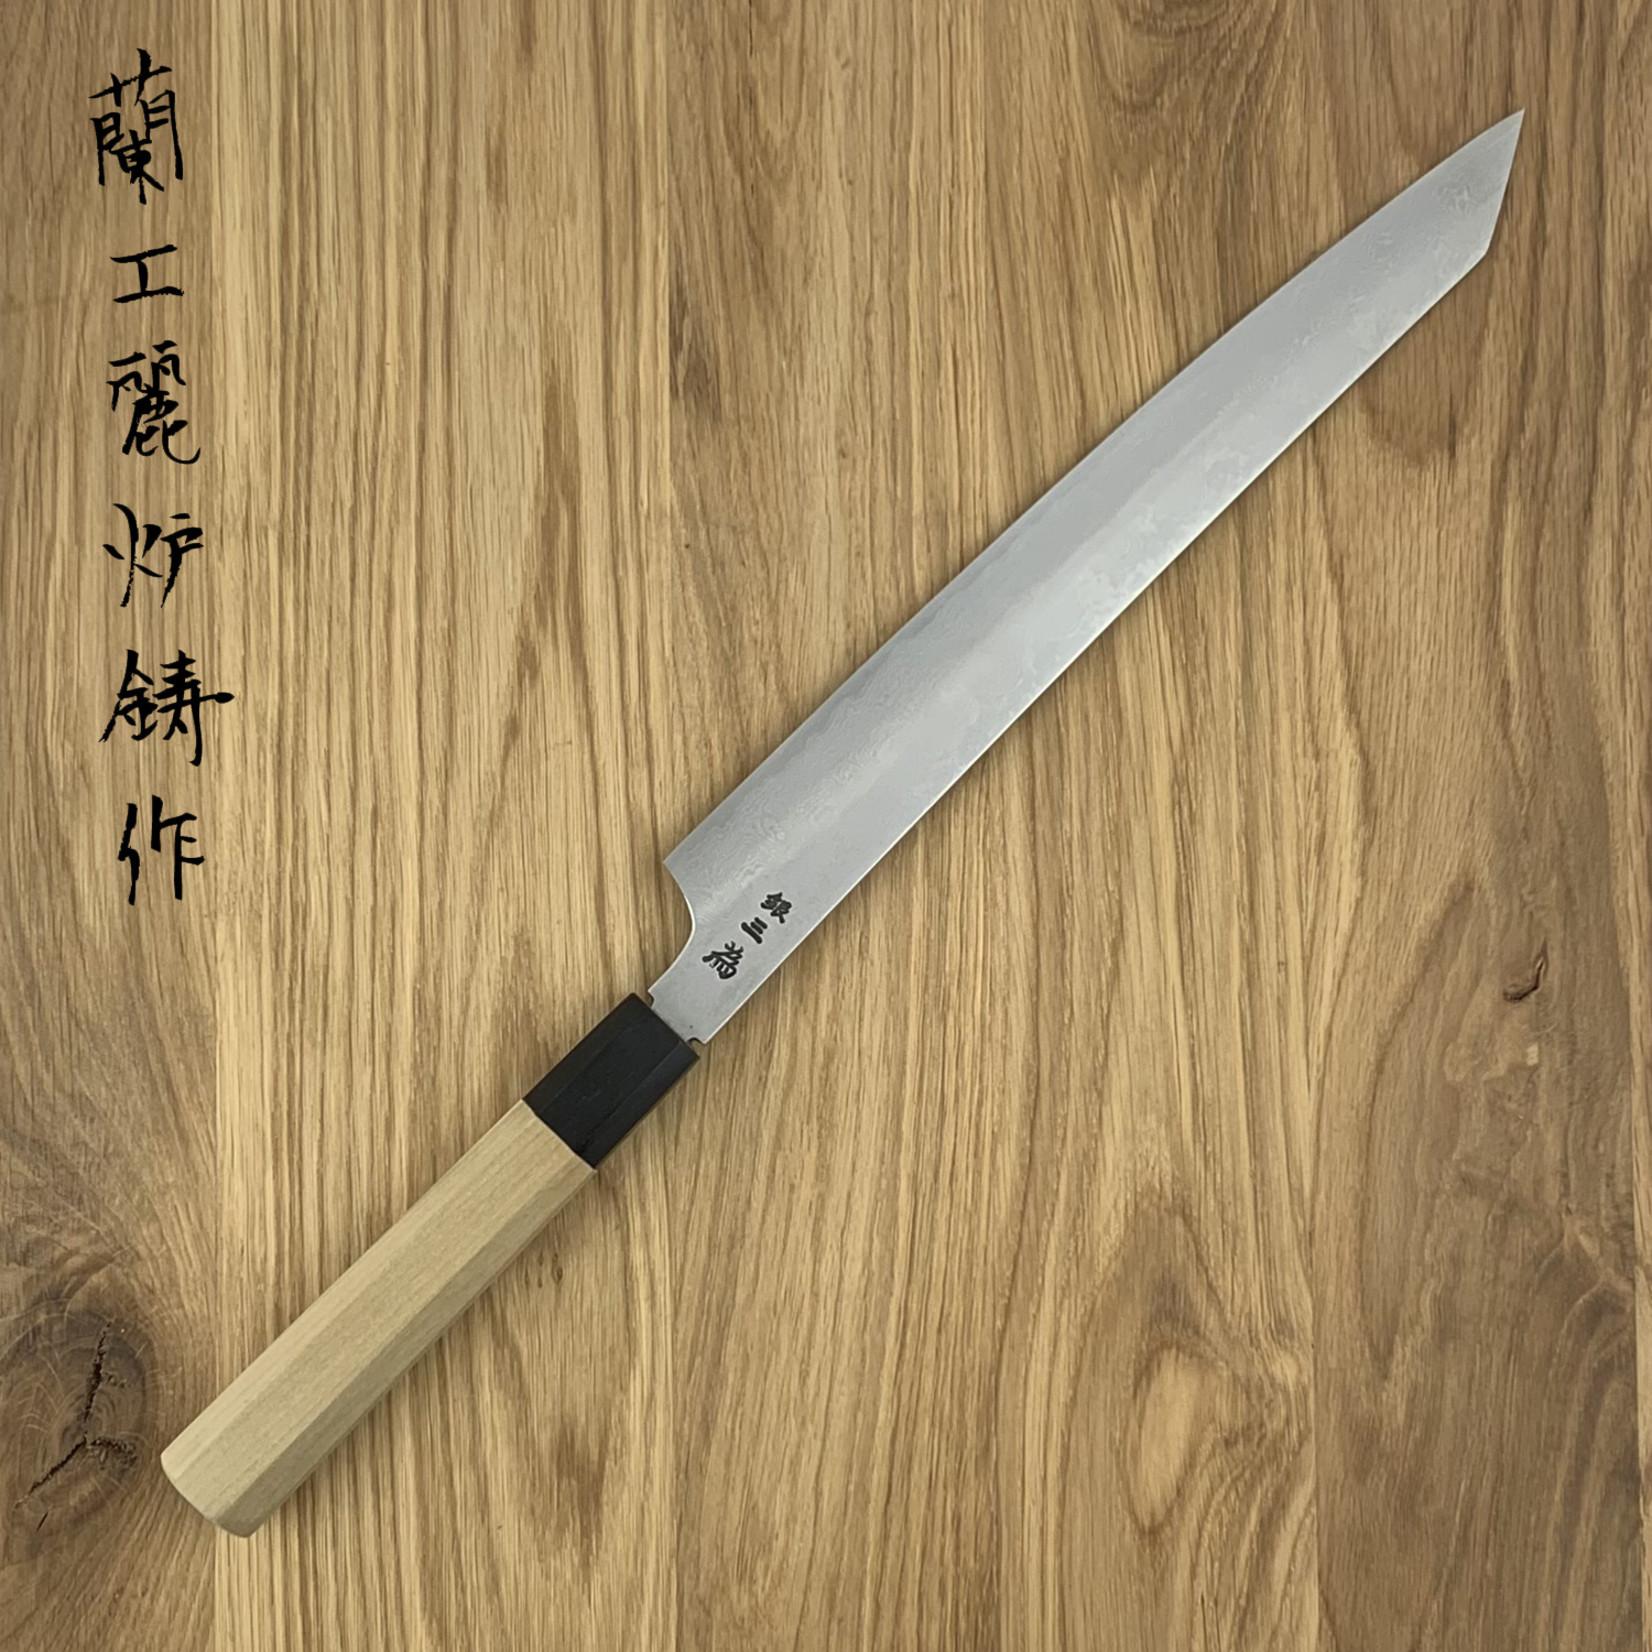 SAKAI TAKAYUKI 33 layers Gin san #3 Kengata 270 mm 14134